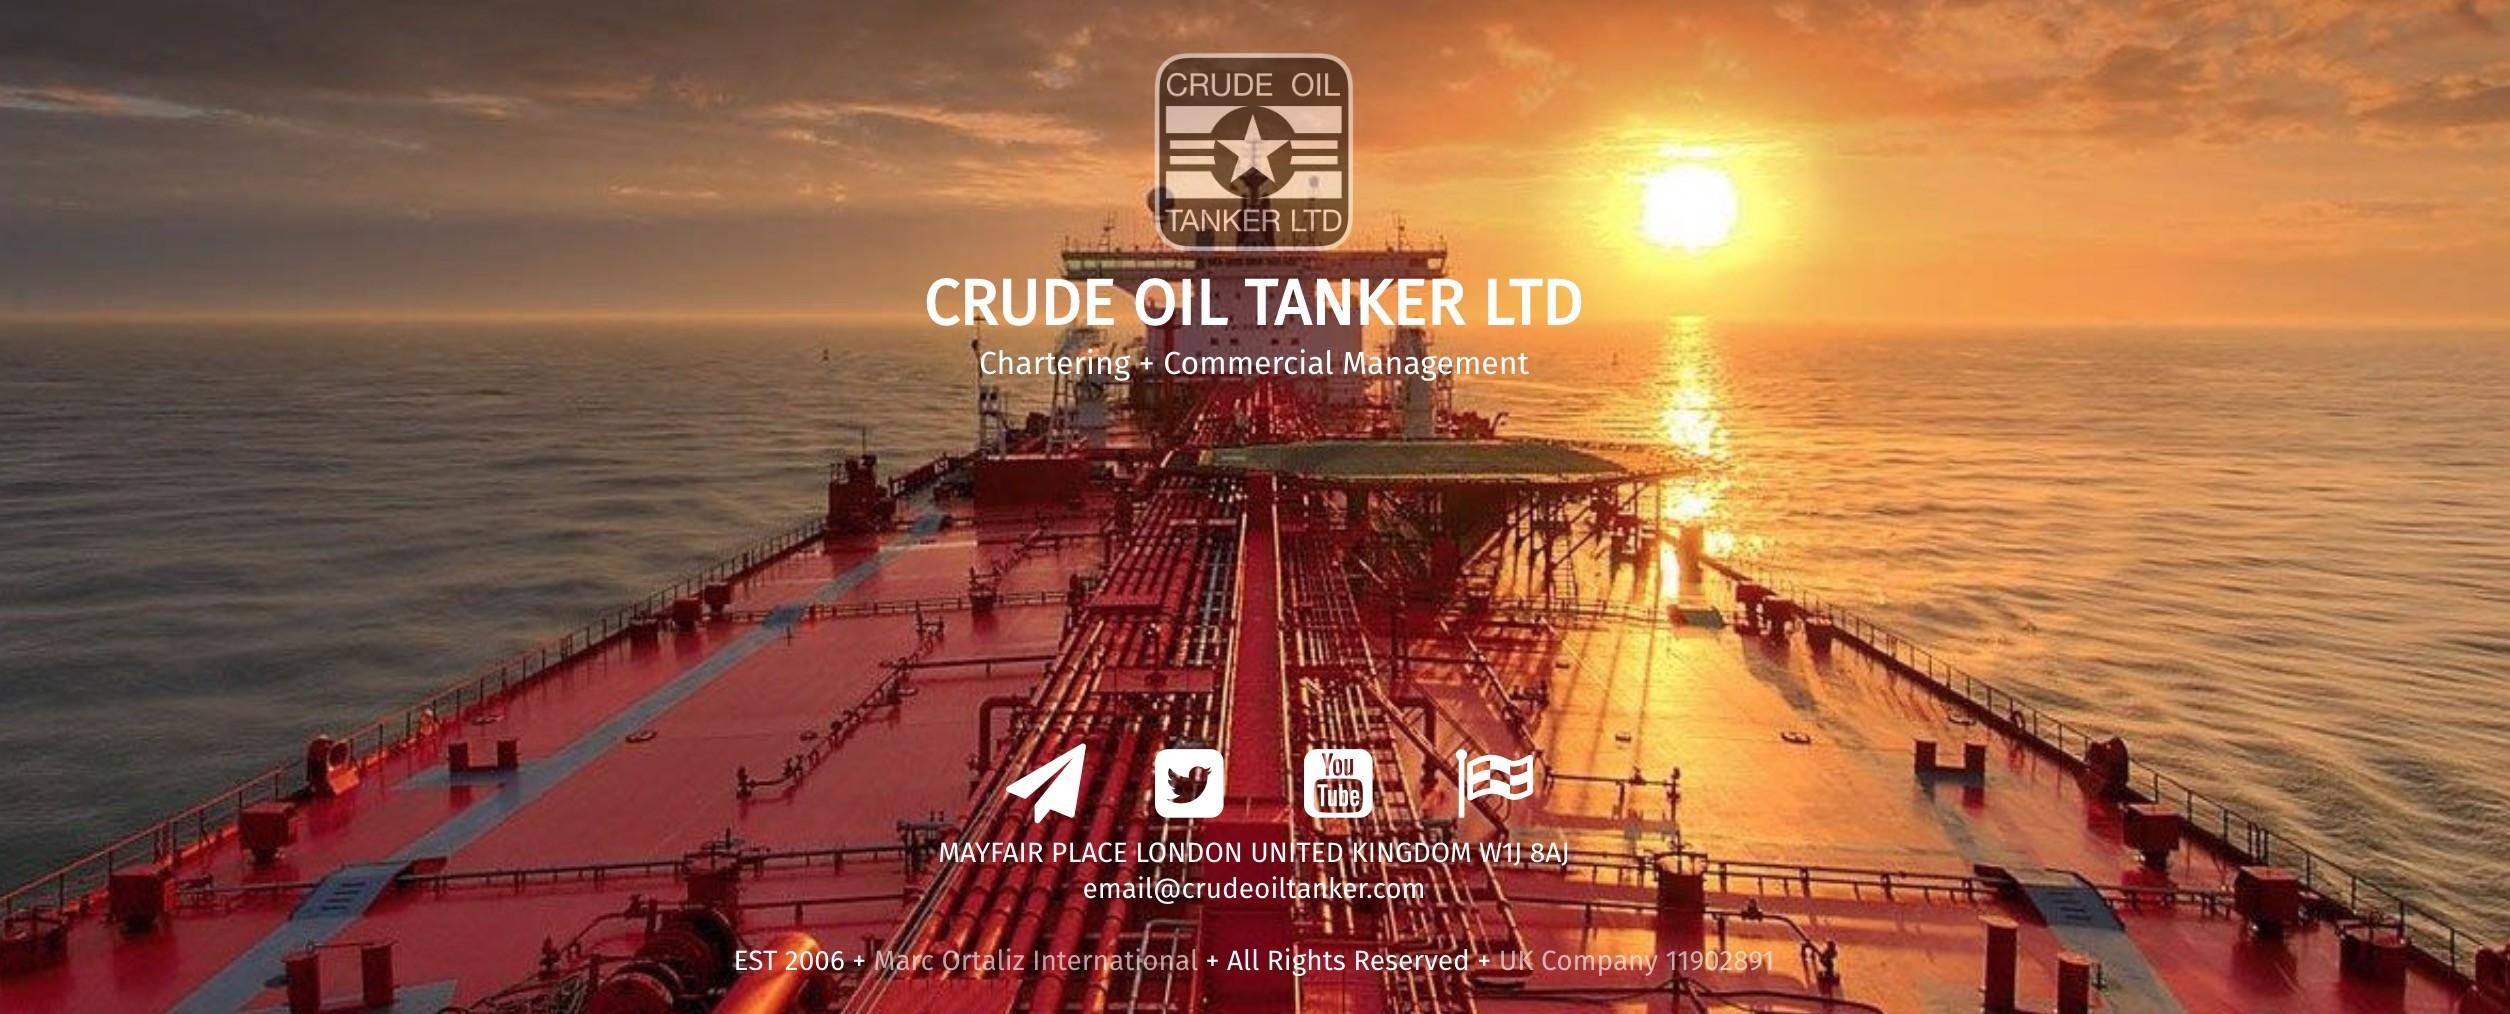 Crude Oil Tanker Ltd | LinkedIn